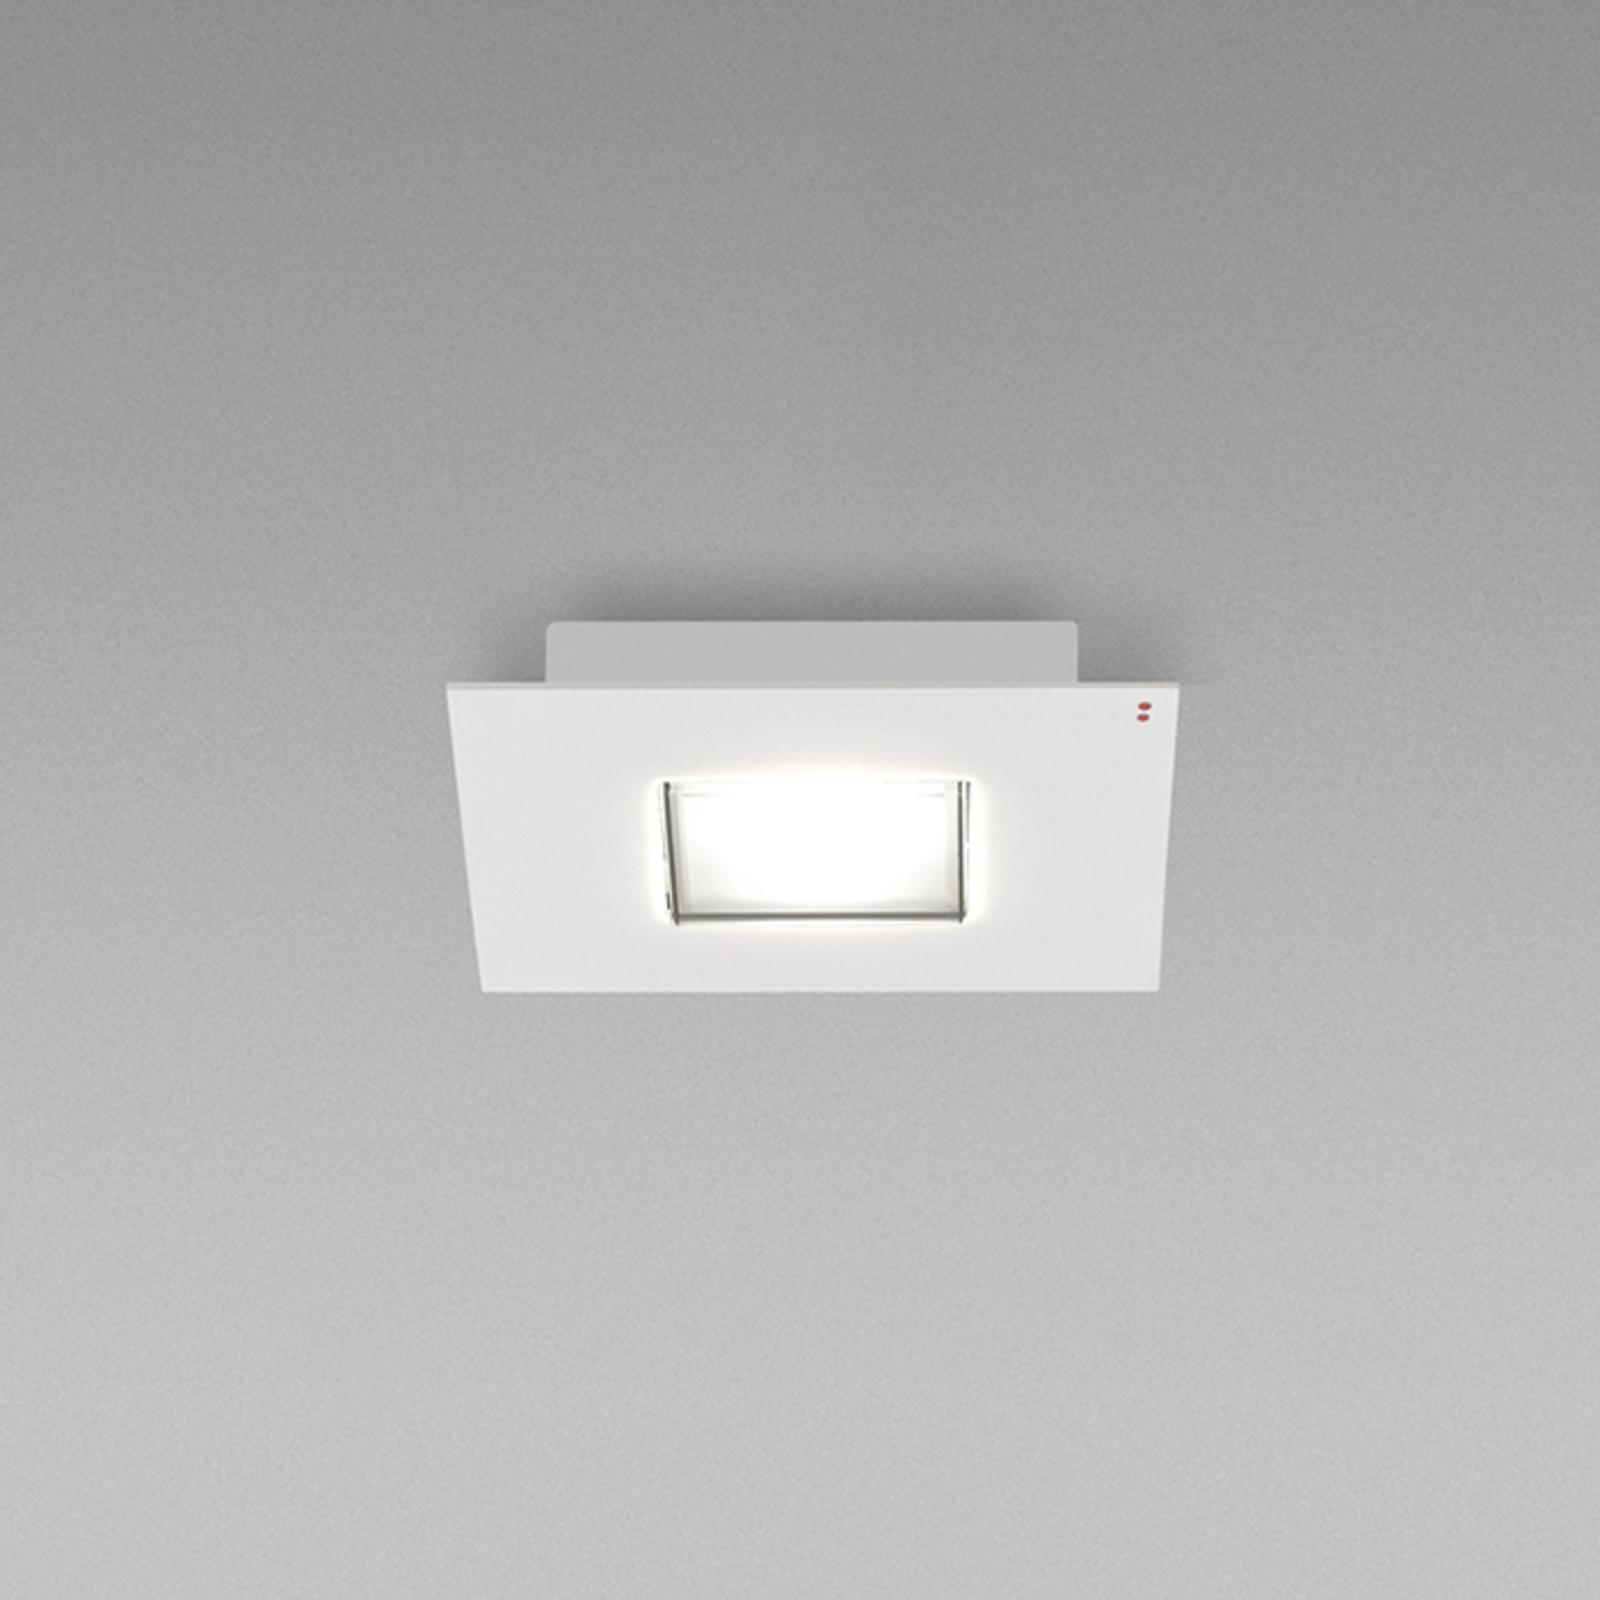 Kwadratowa lampa sufitowa LED Quarter